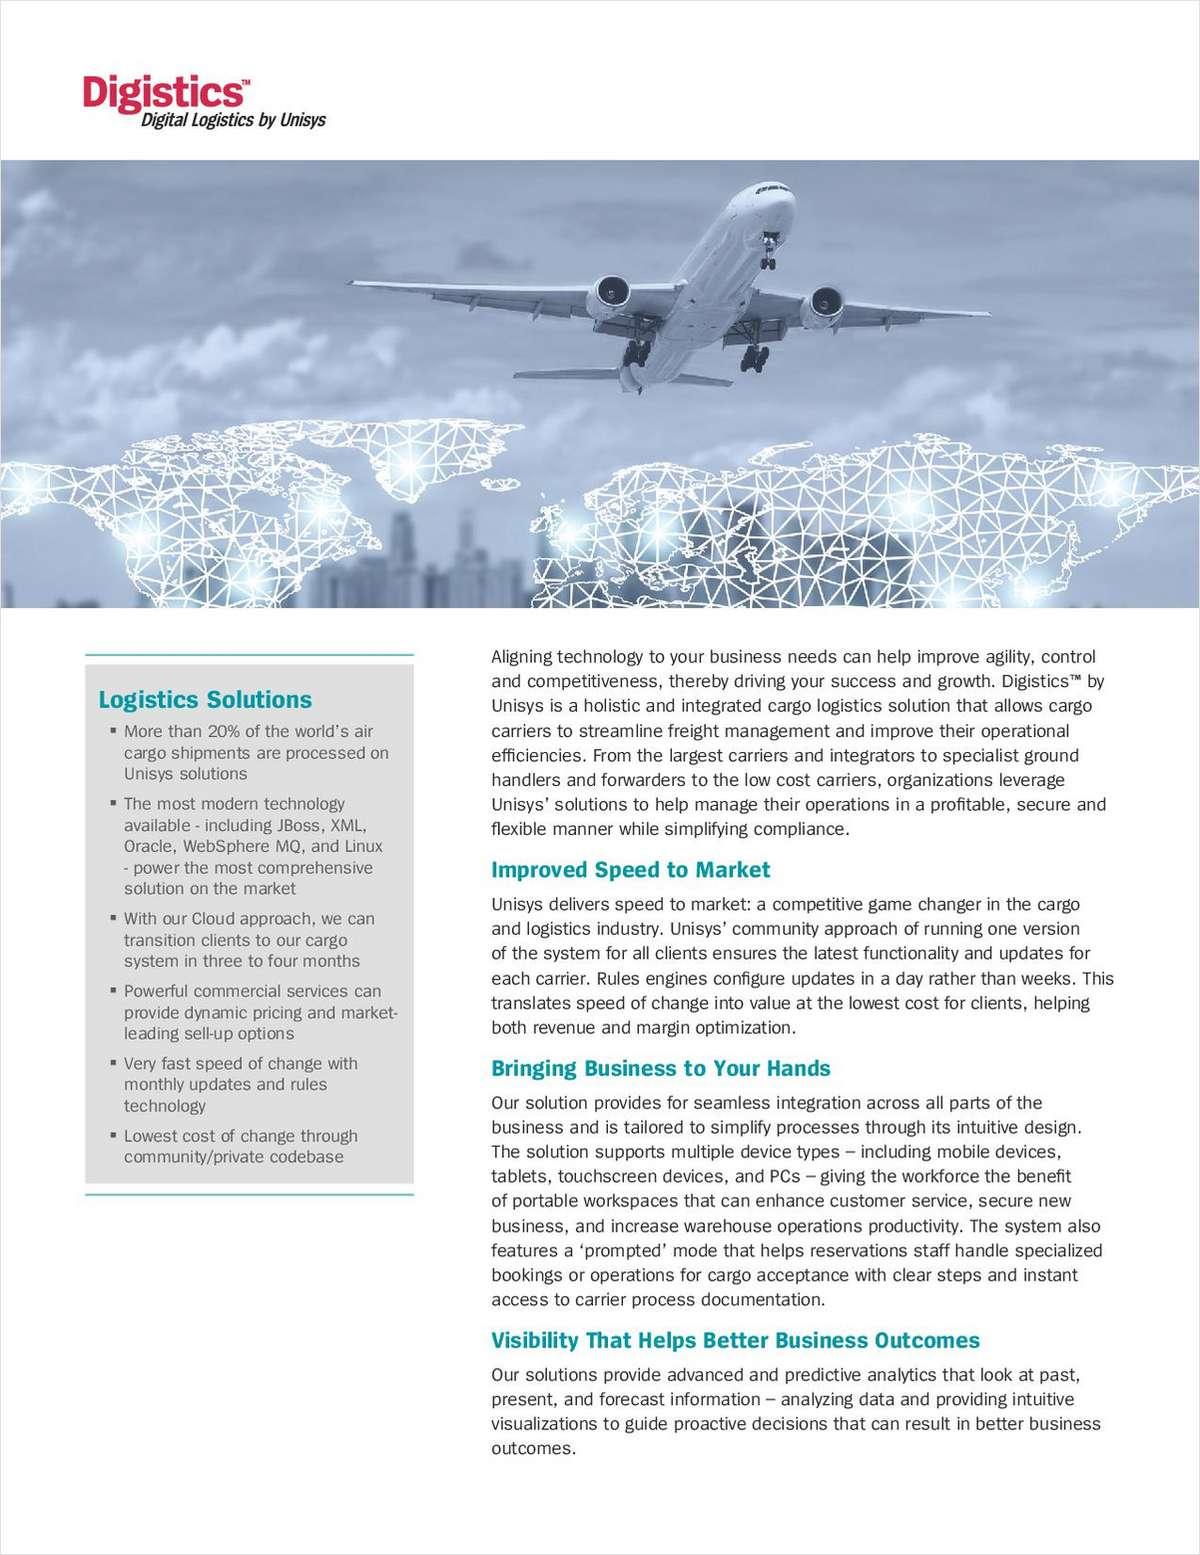 How Digital Logistics Drives Success and Growth